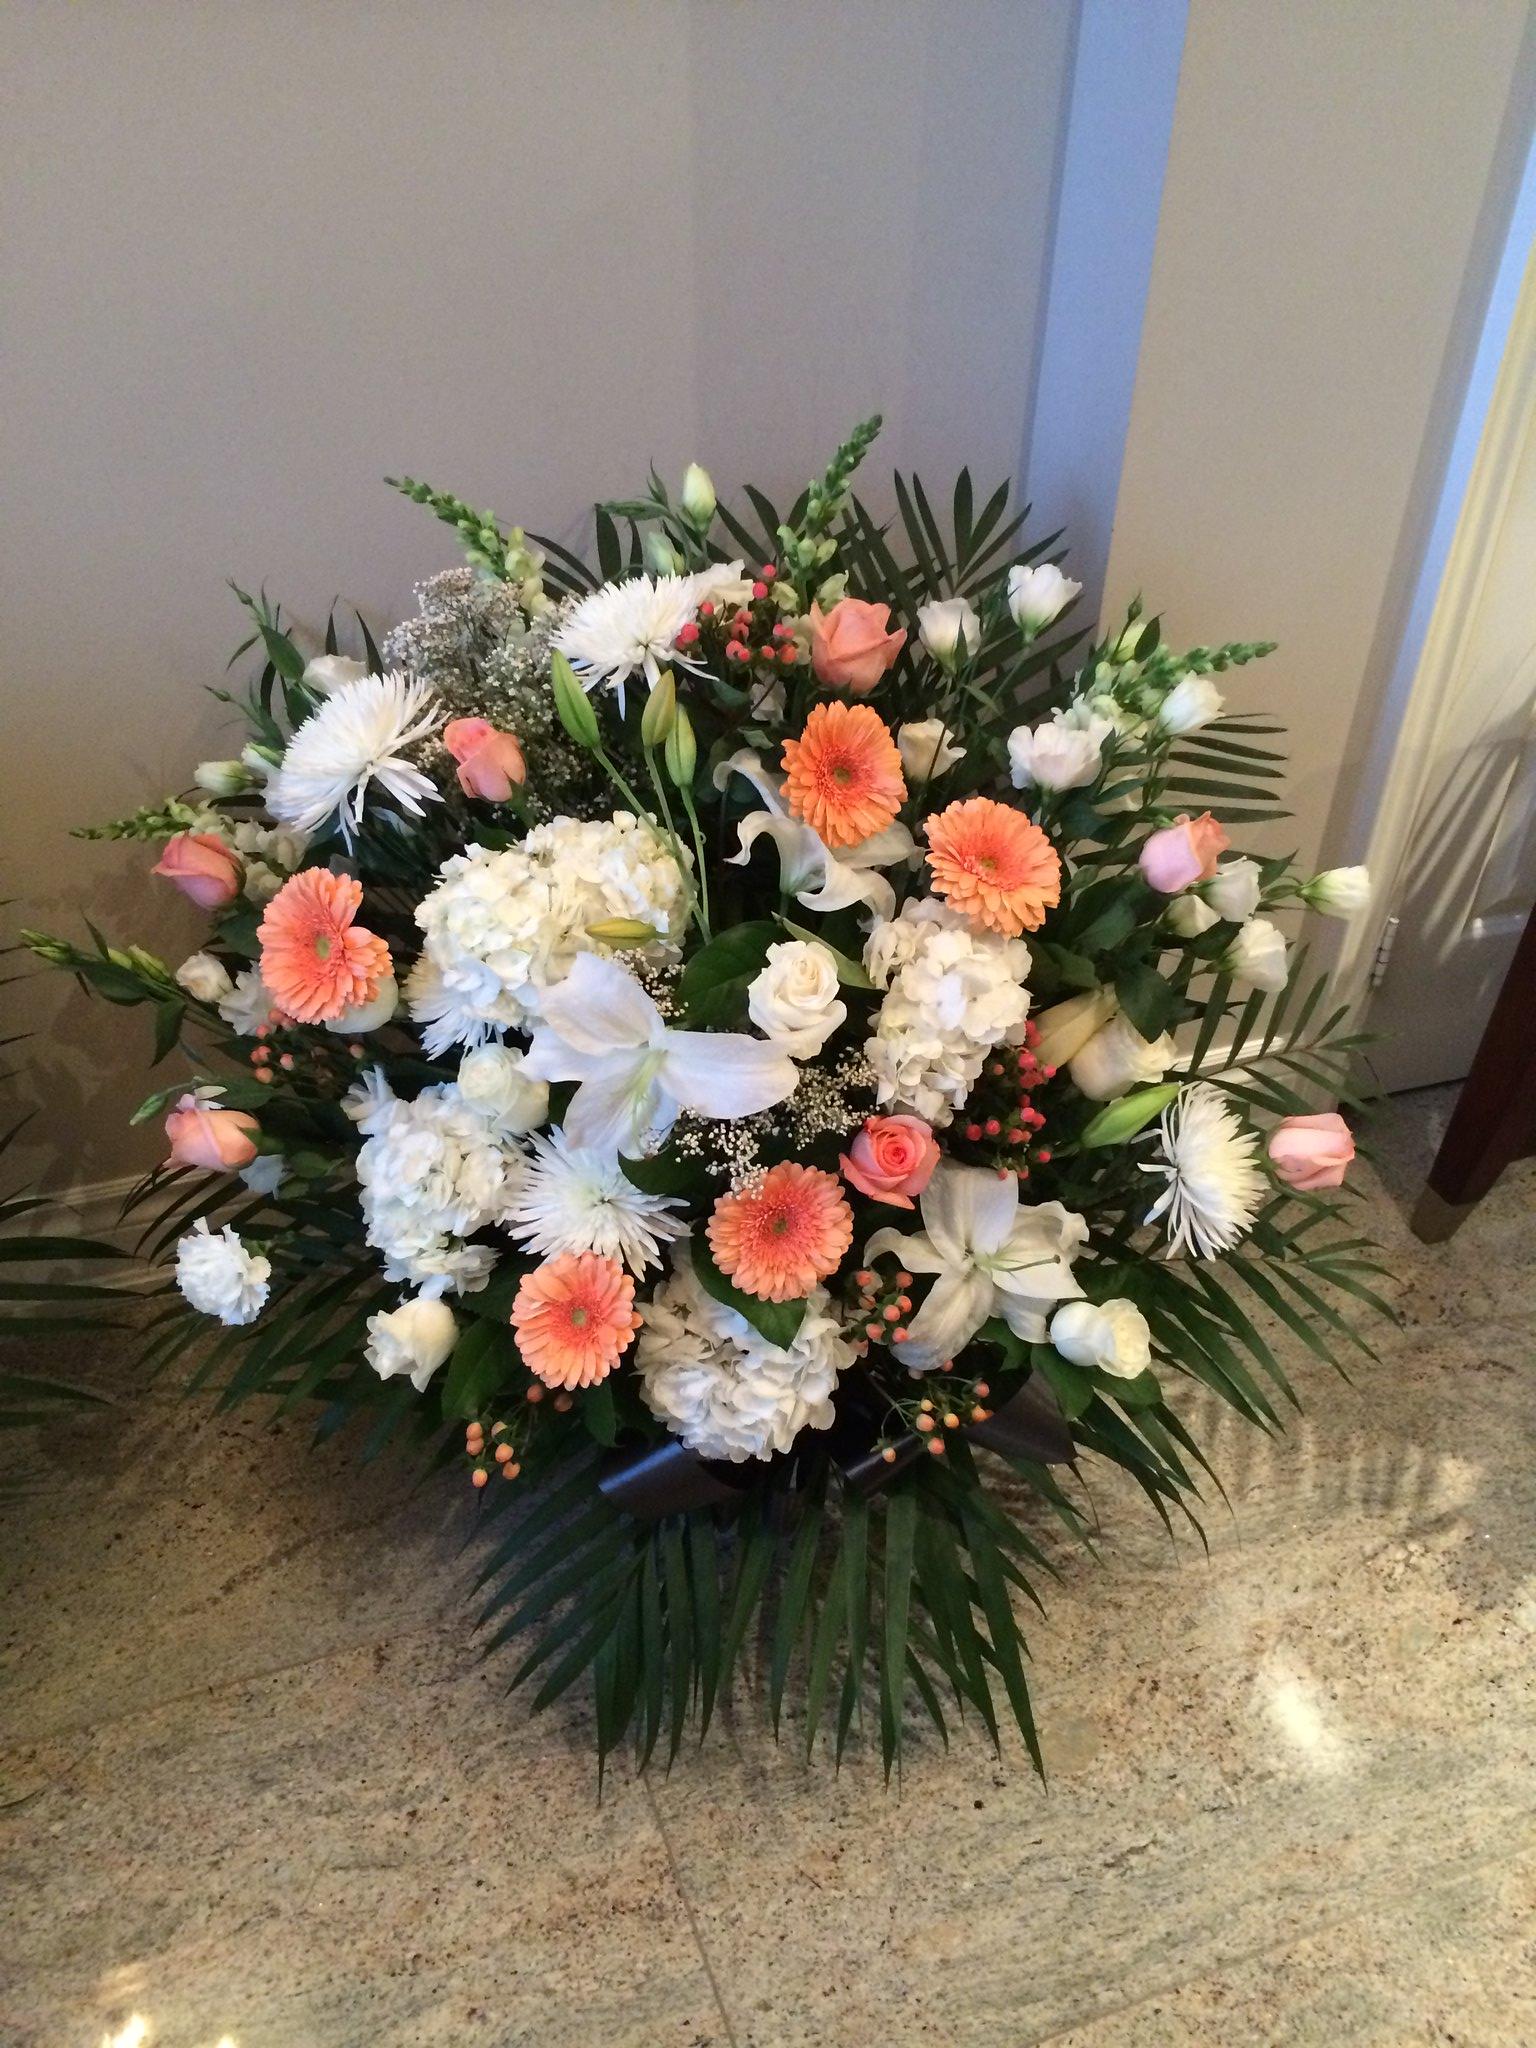 Funeral basket$150-180